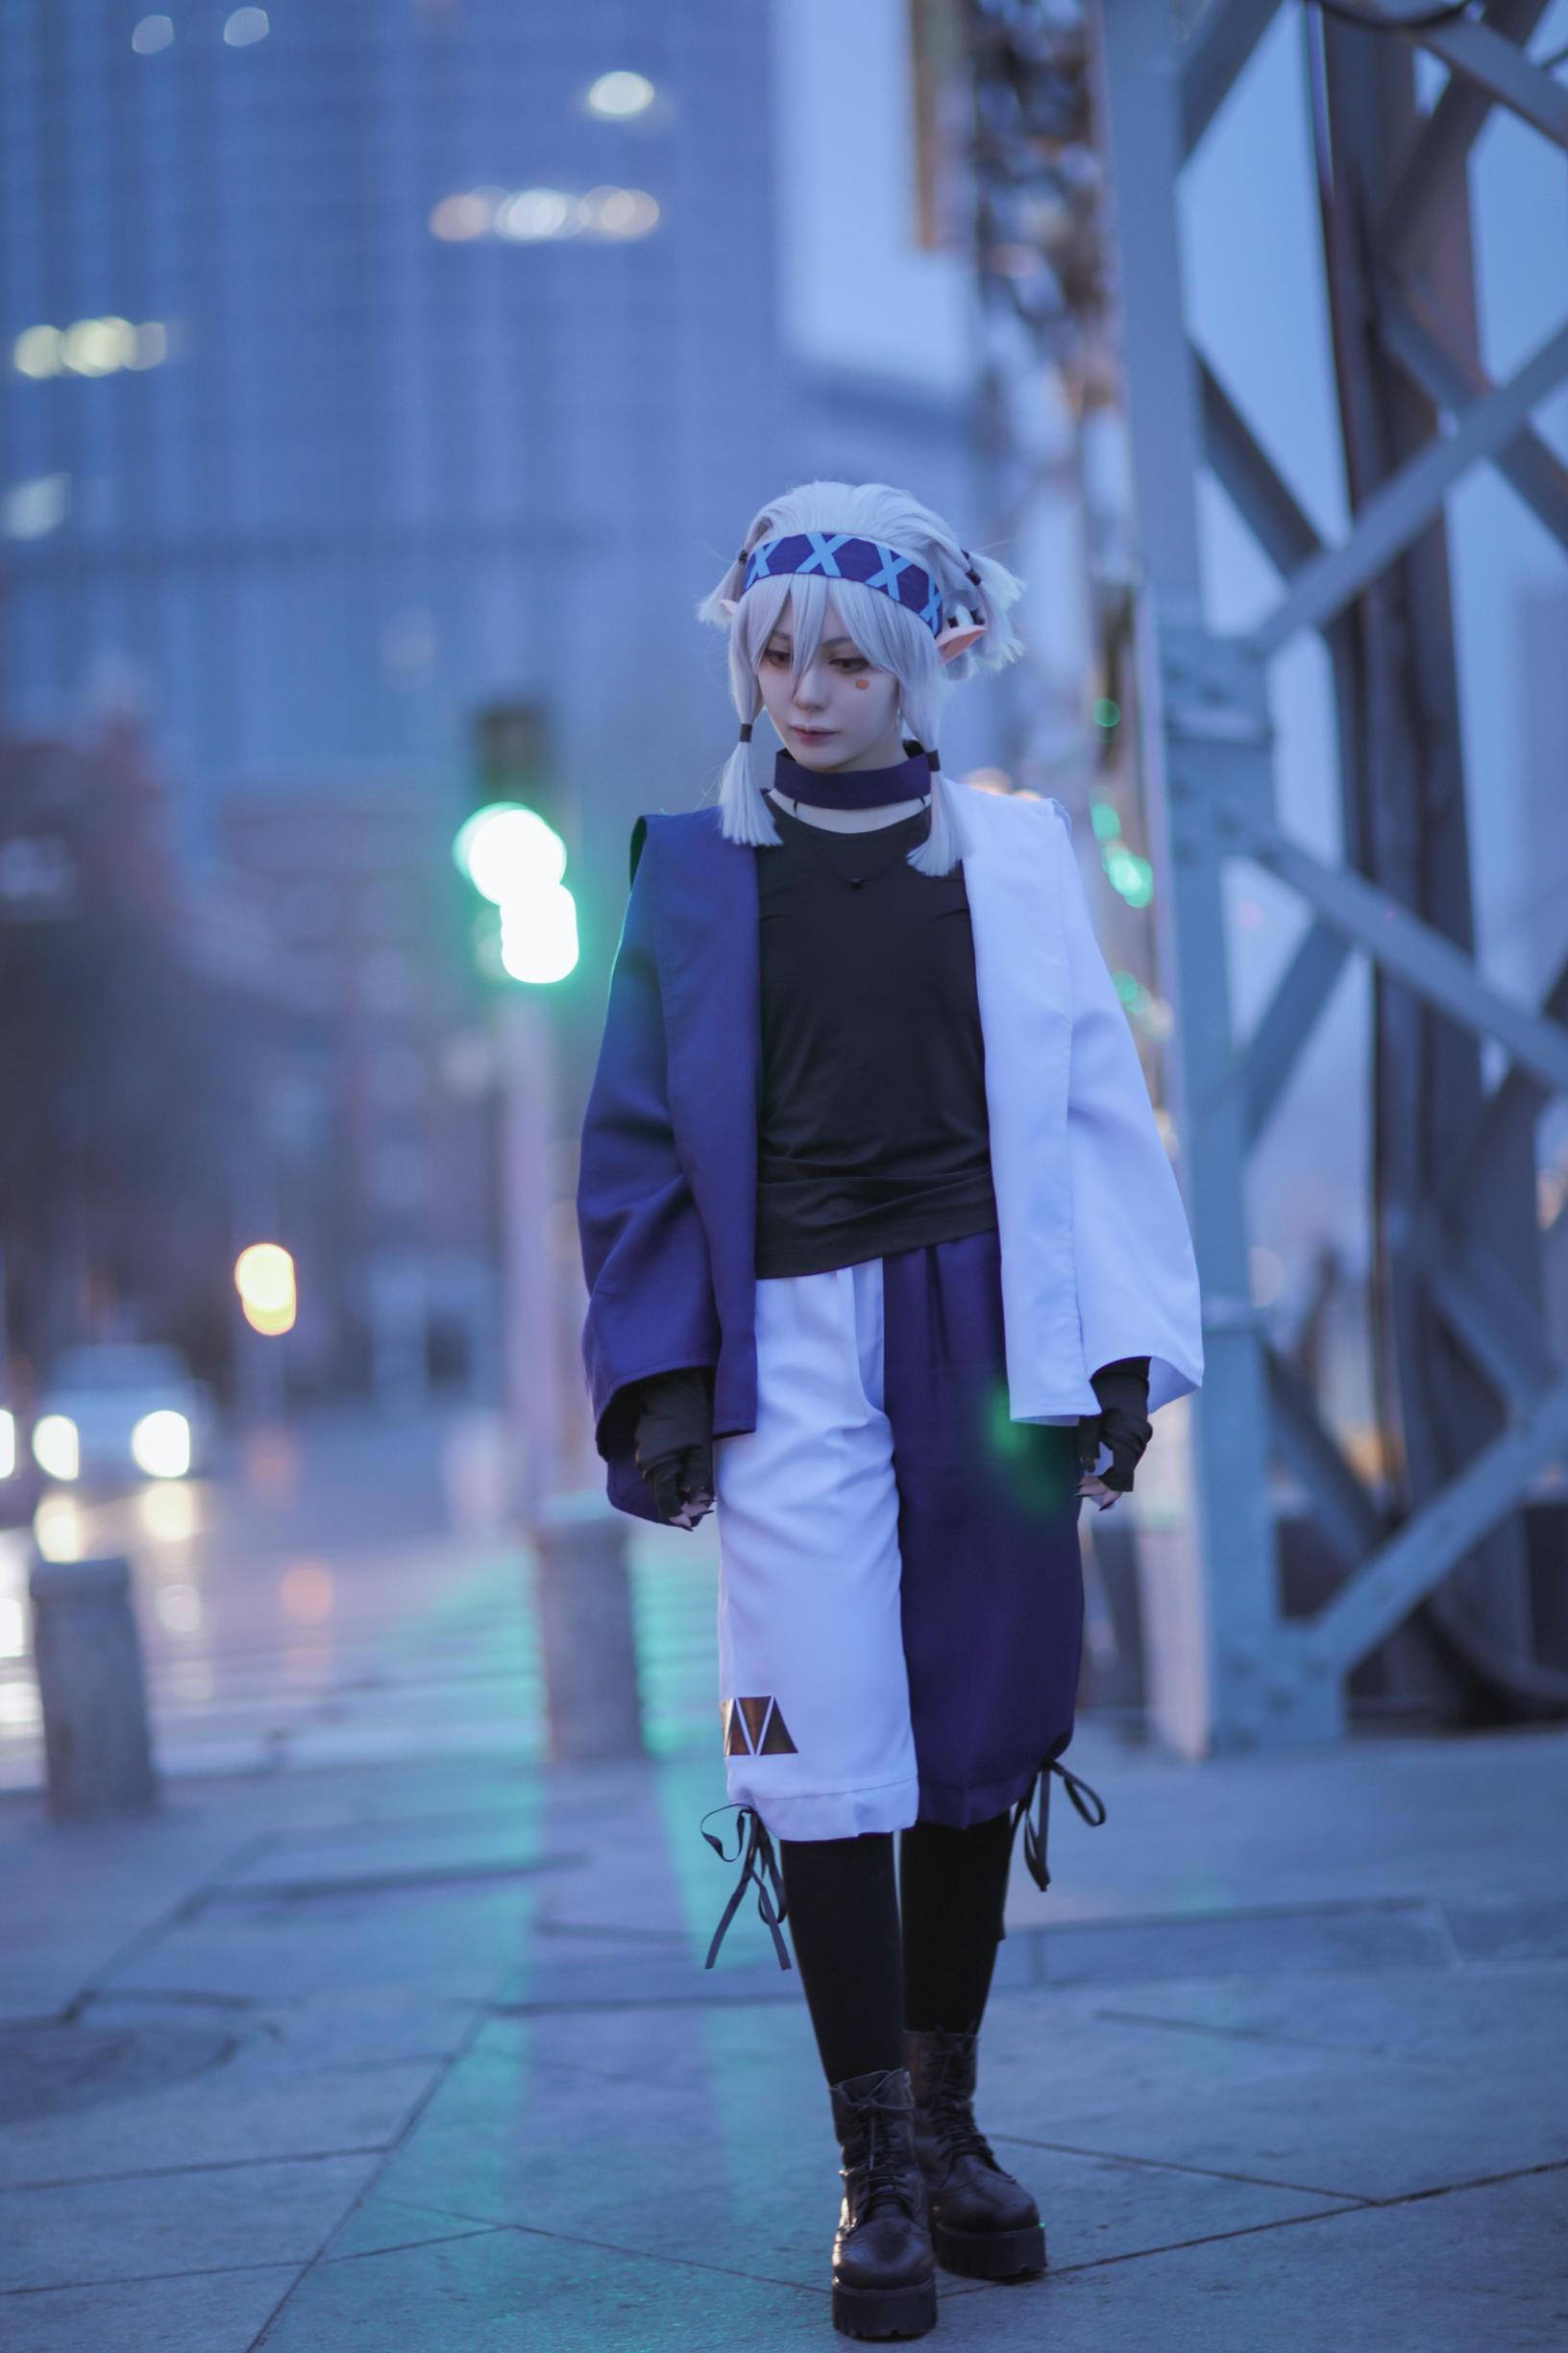 《凹凸世界》正片cosplay【CN:等待幸运の恒星】-第2张